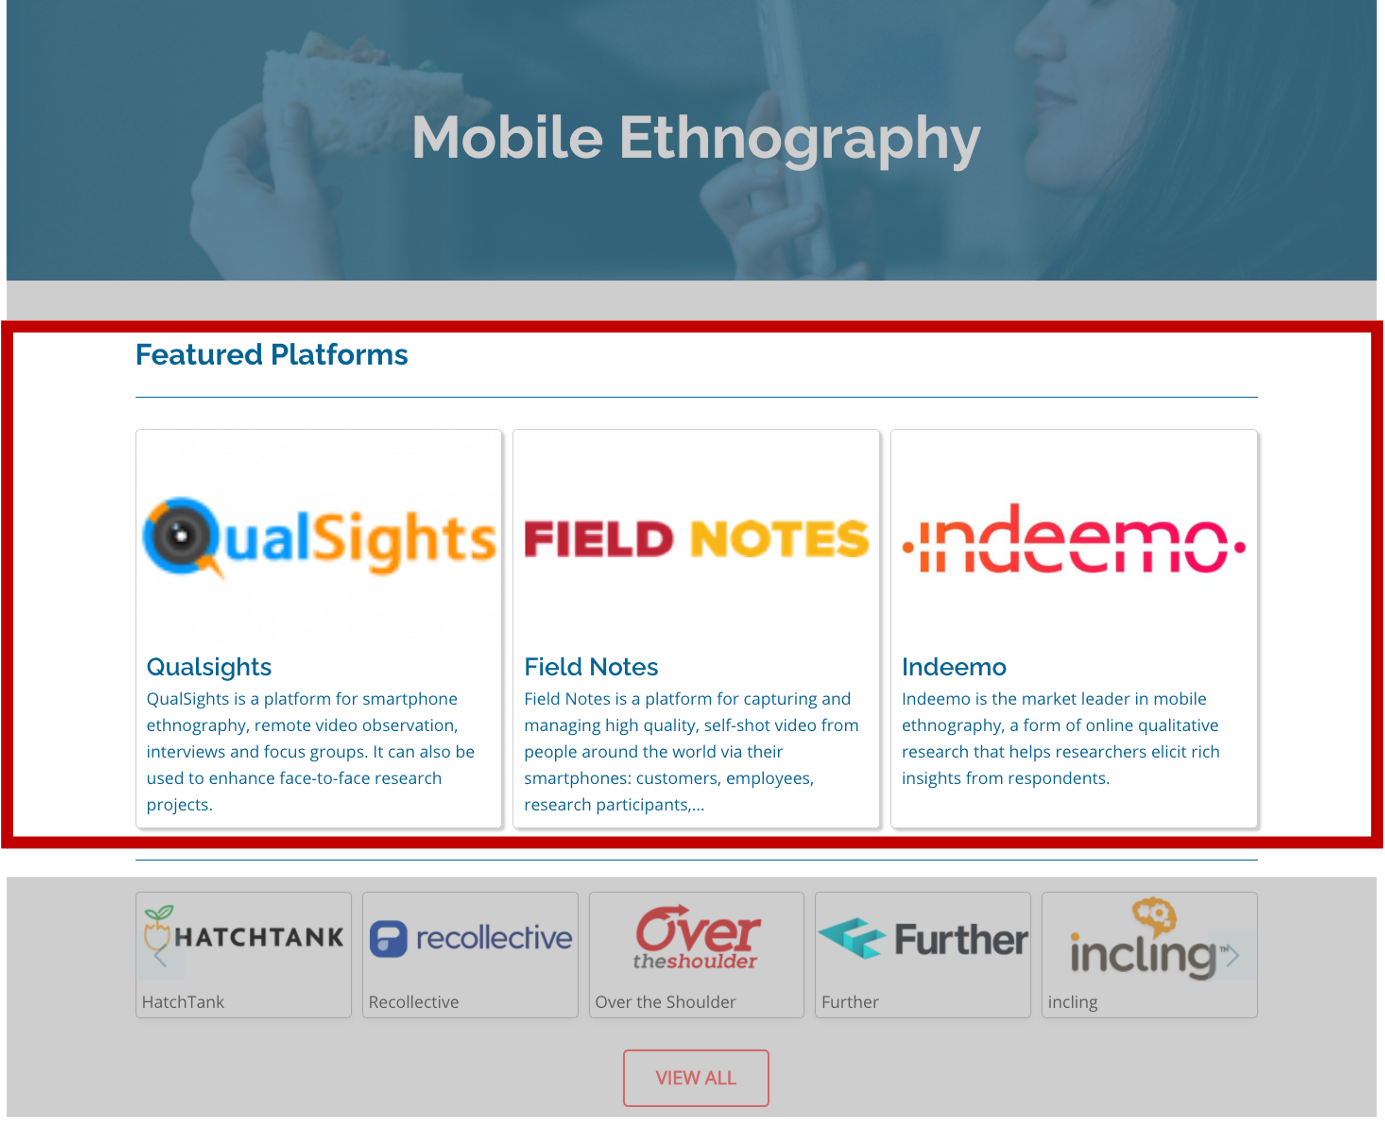 Category Page Prime Position - Insight Platforms